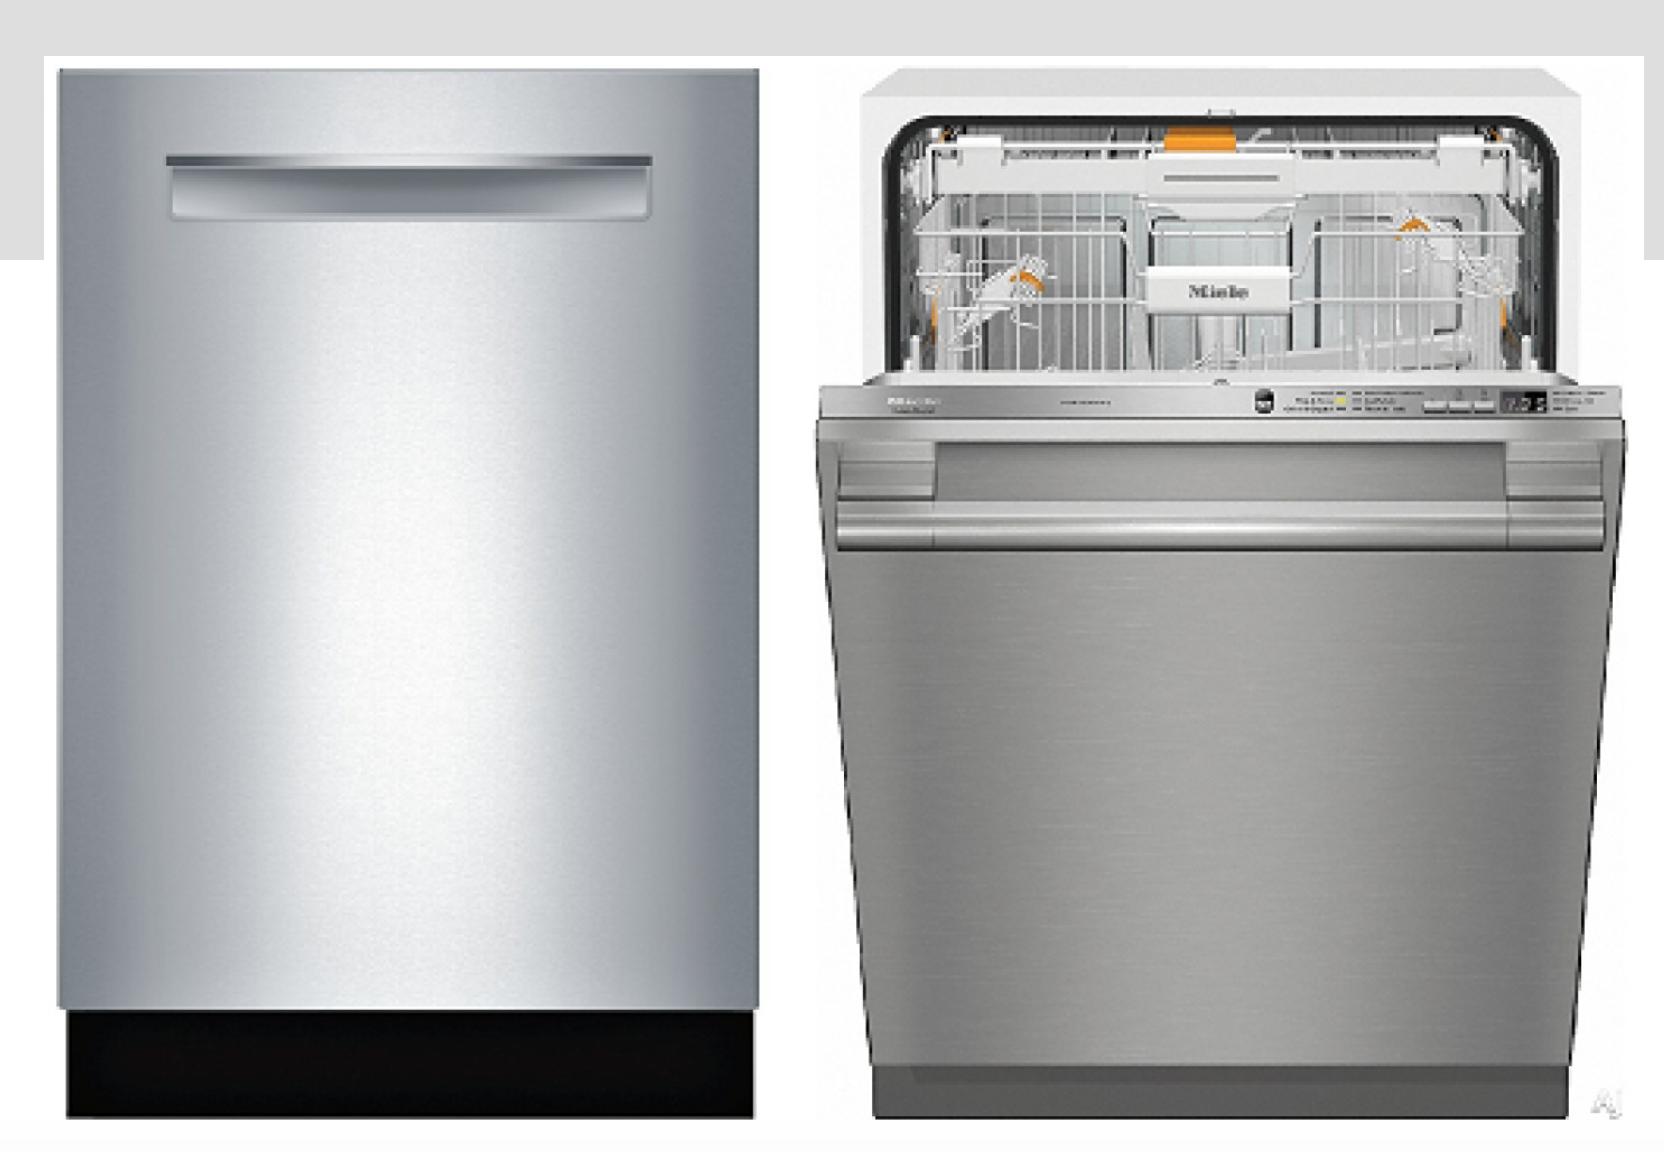 Miele Vs Bosch Dishwashers Review Dishwasher Reviews Bosch Dishwashers Miele